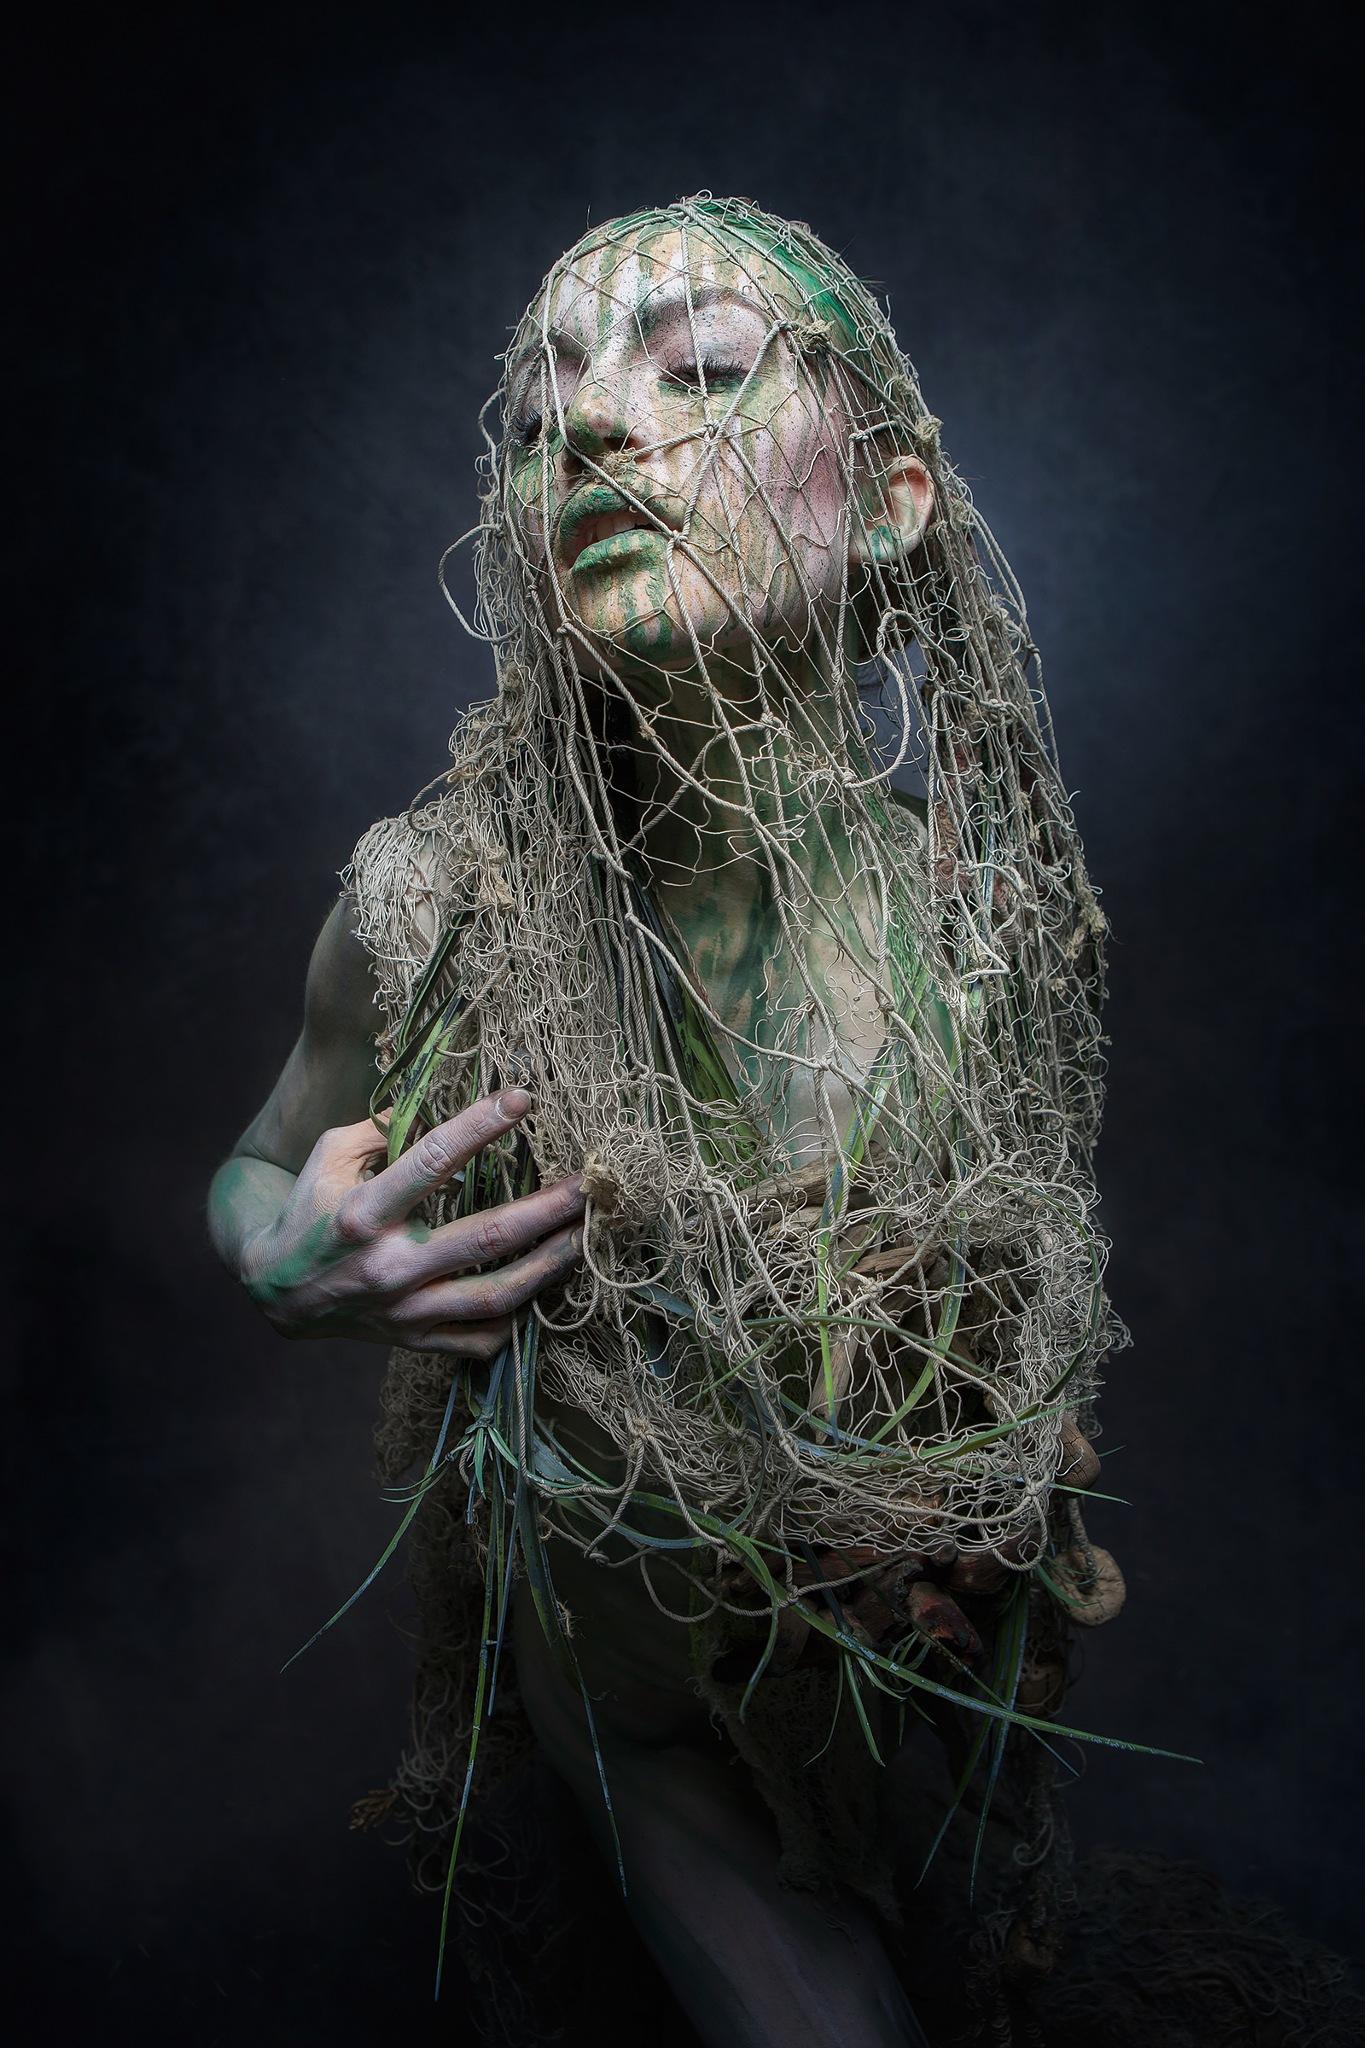 Mermaid by Juergen Sieth